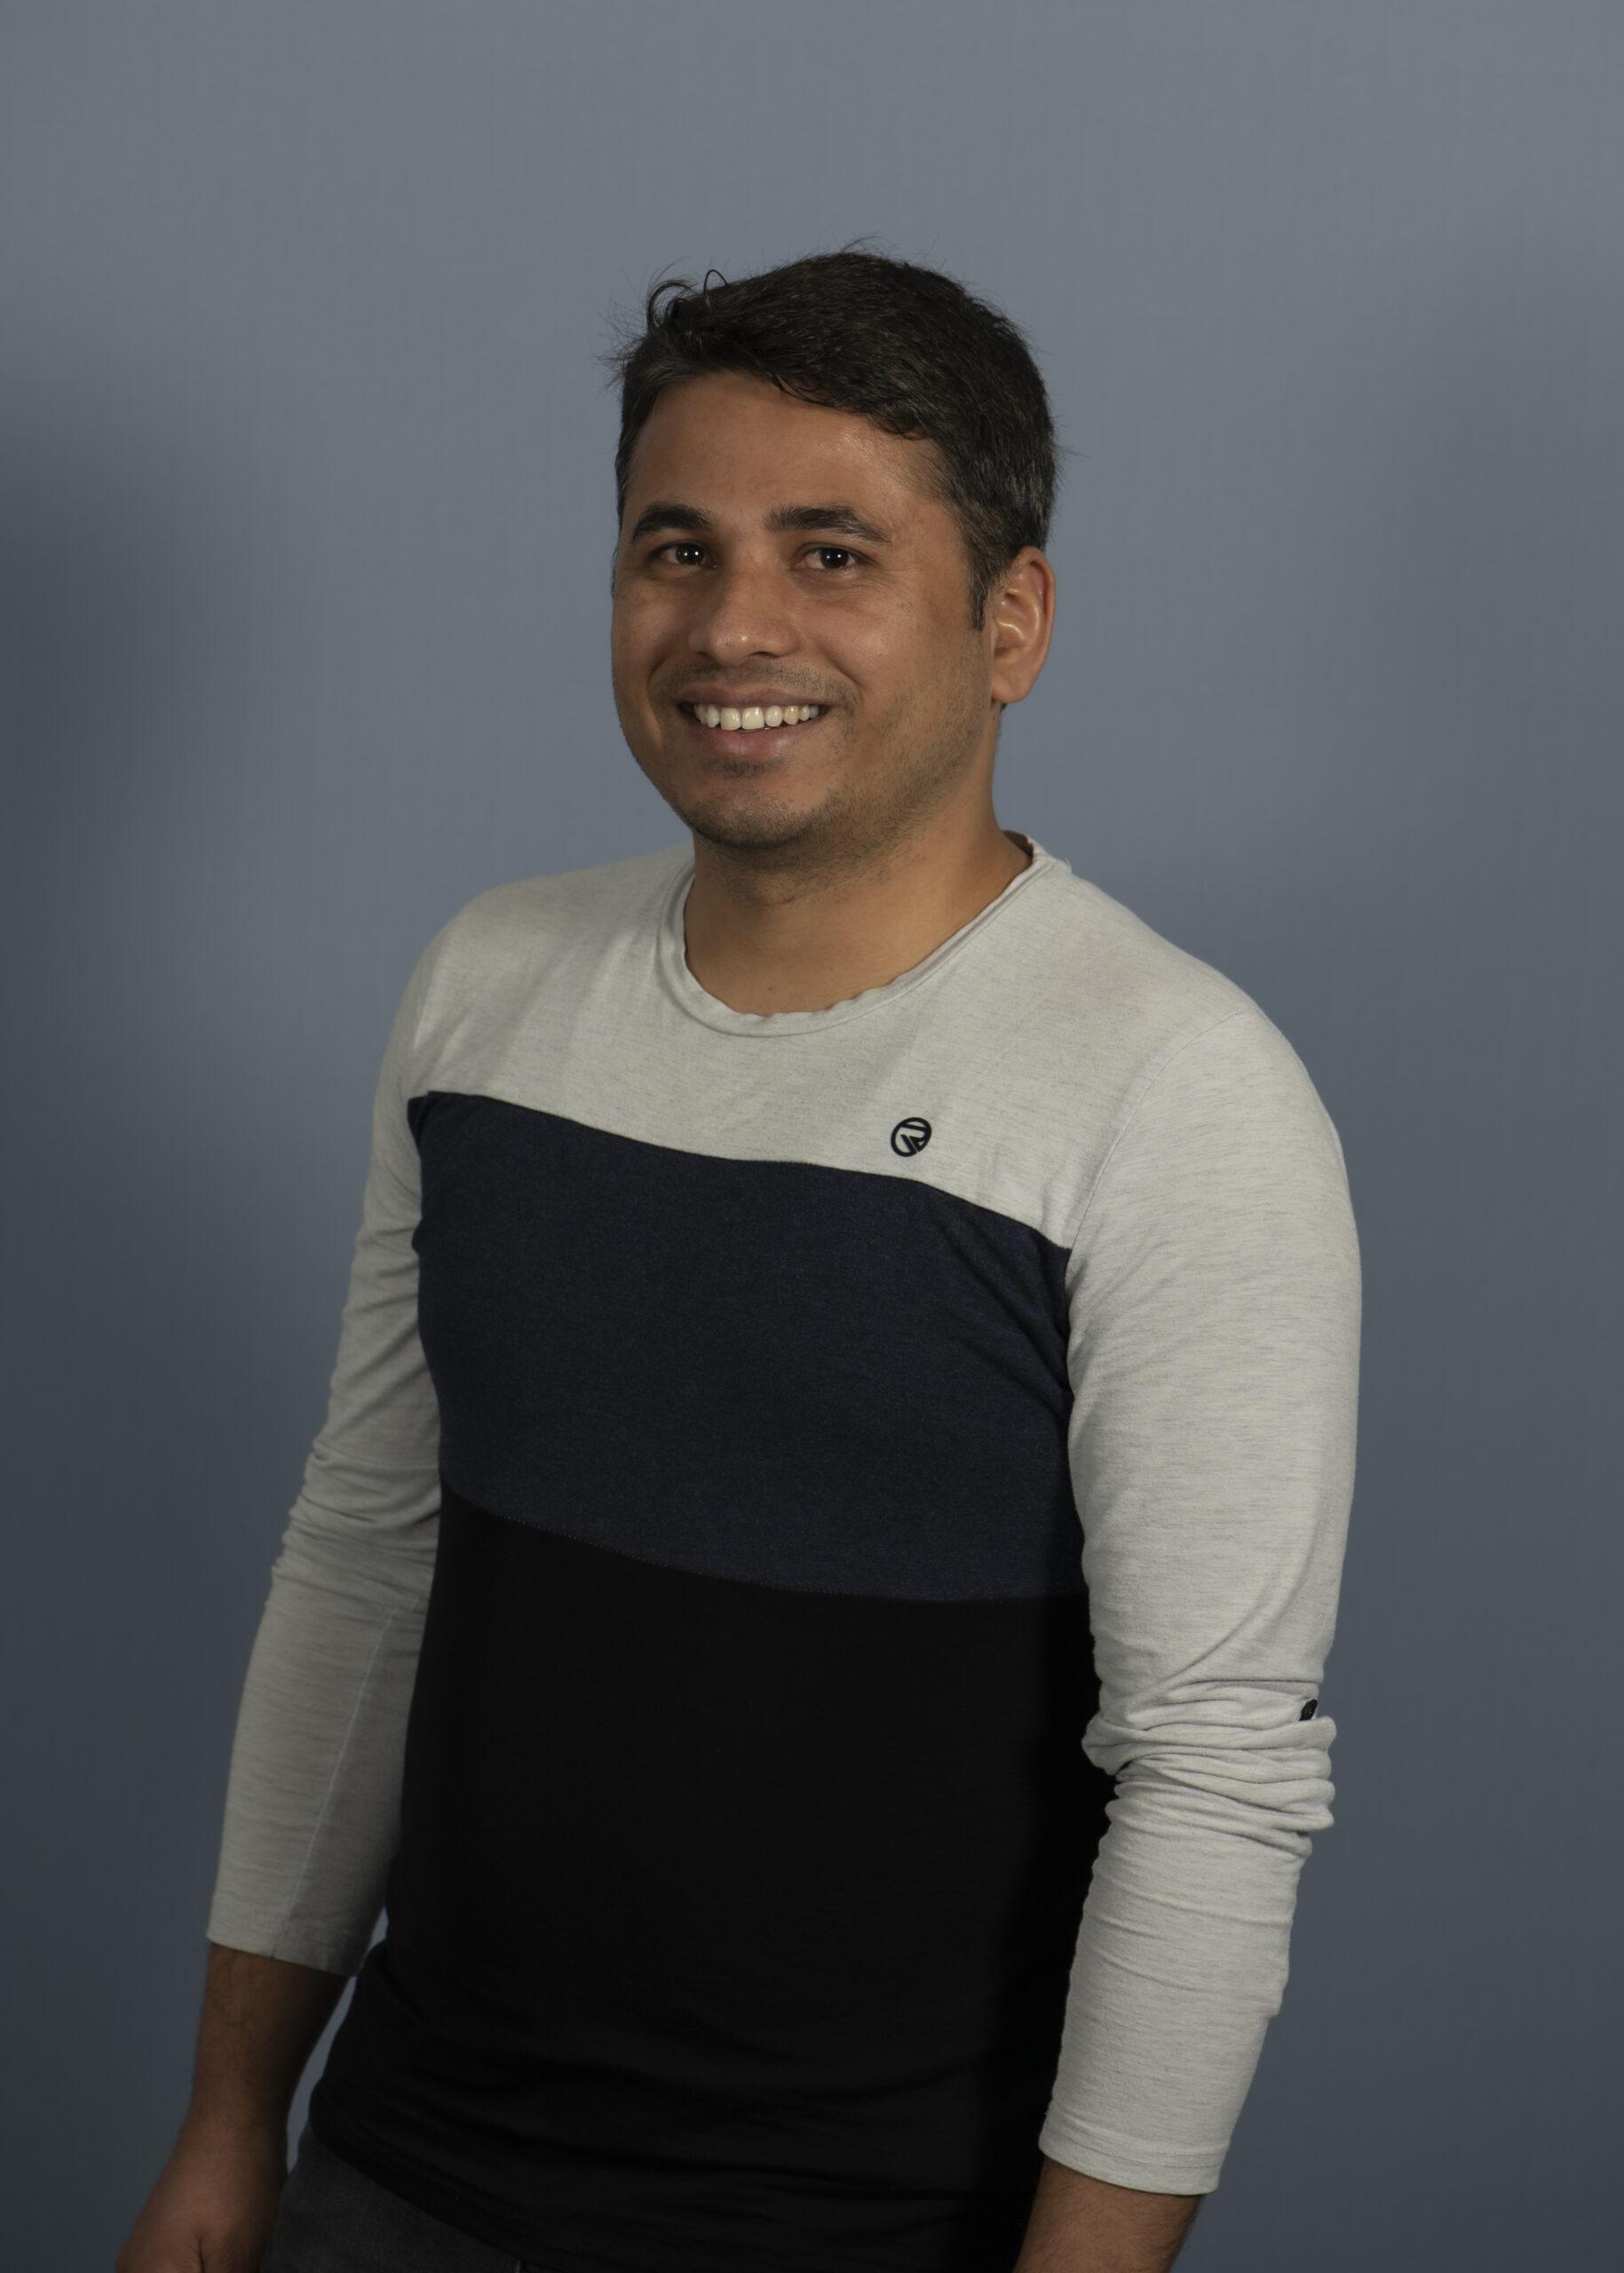 Nagendra Awasthi